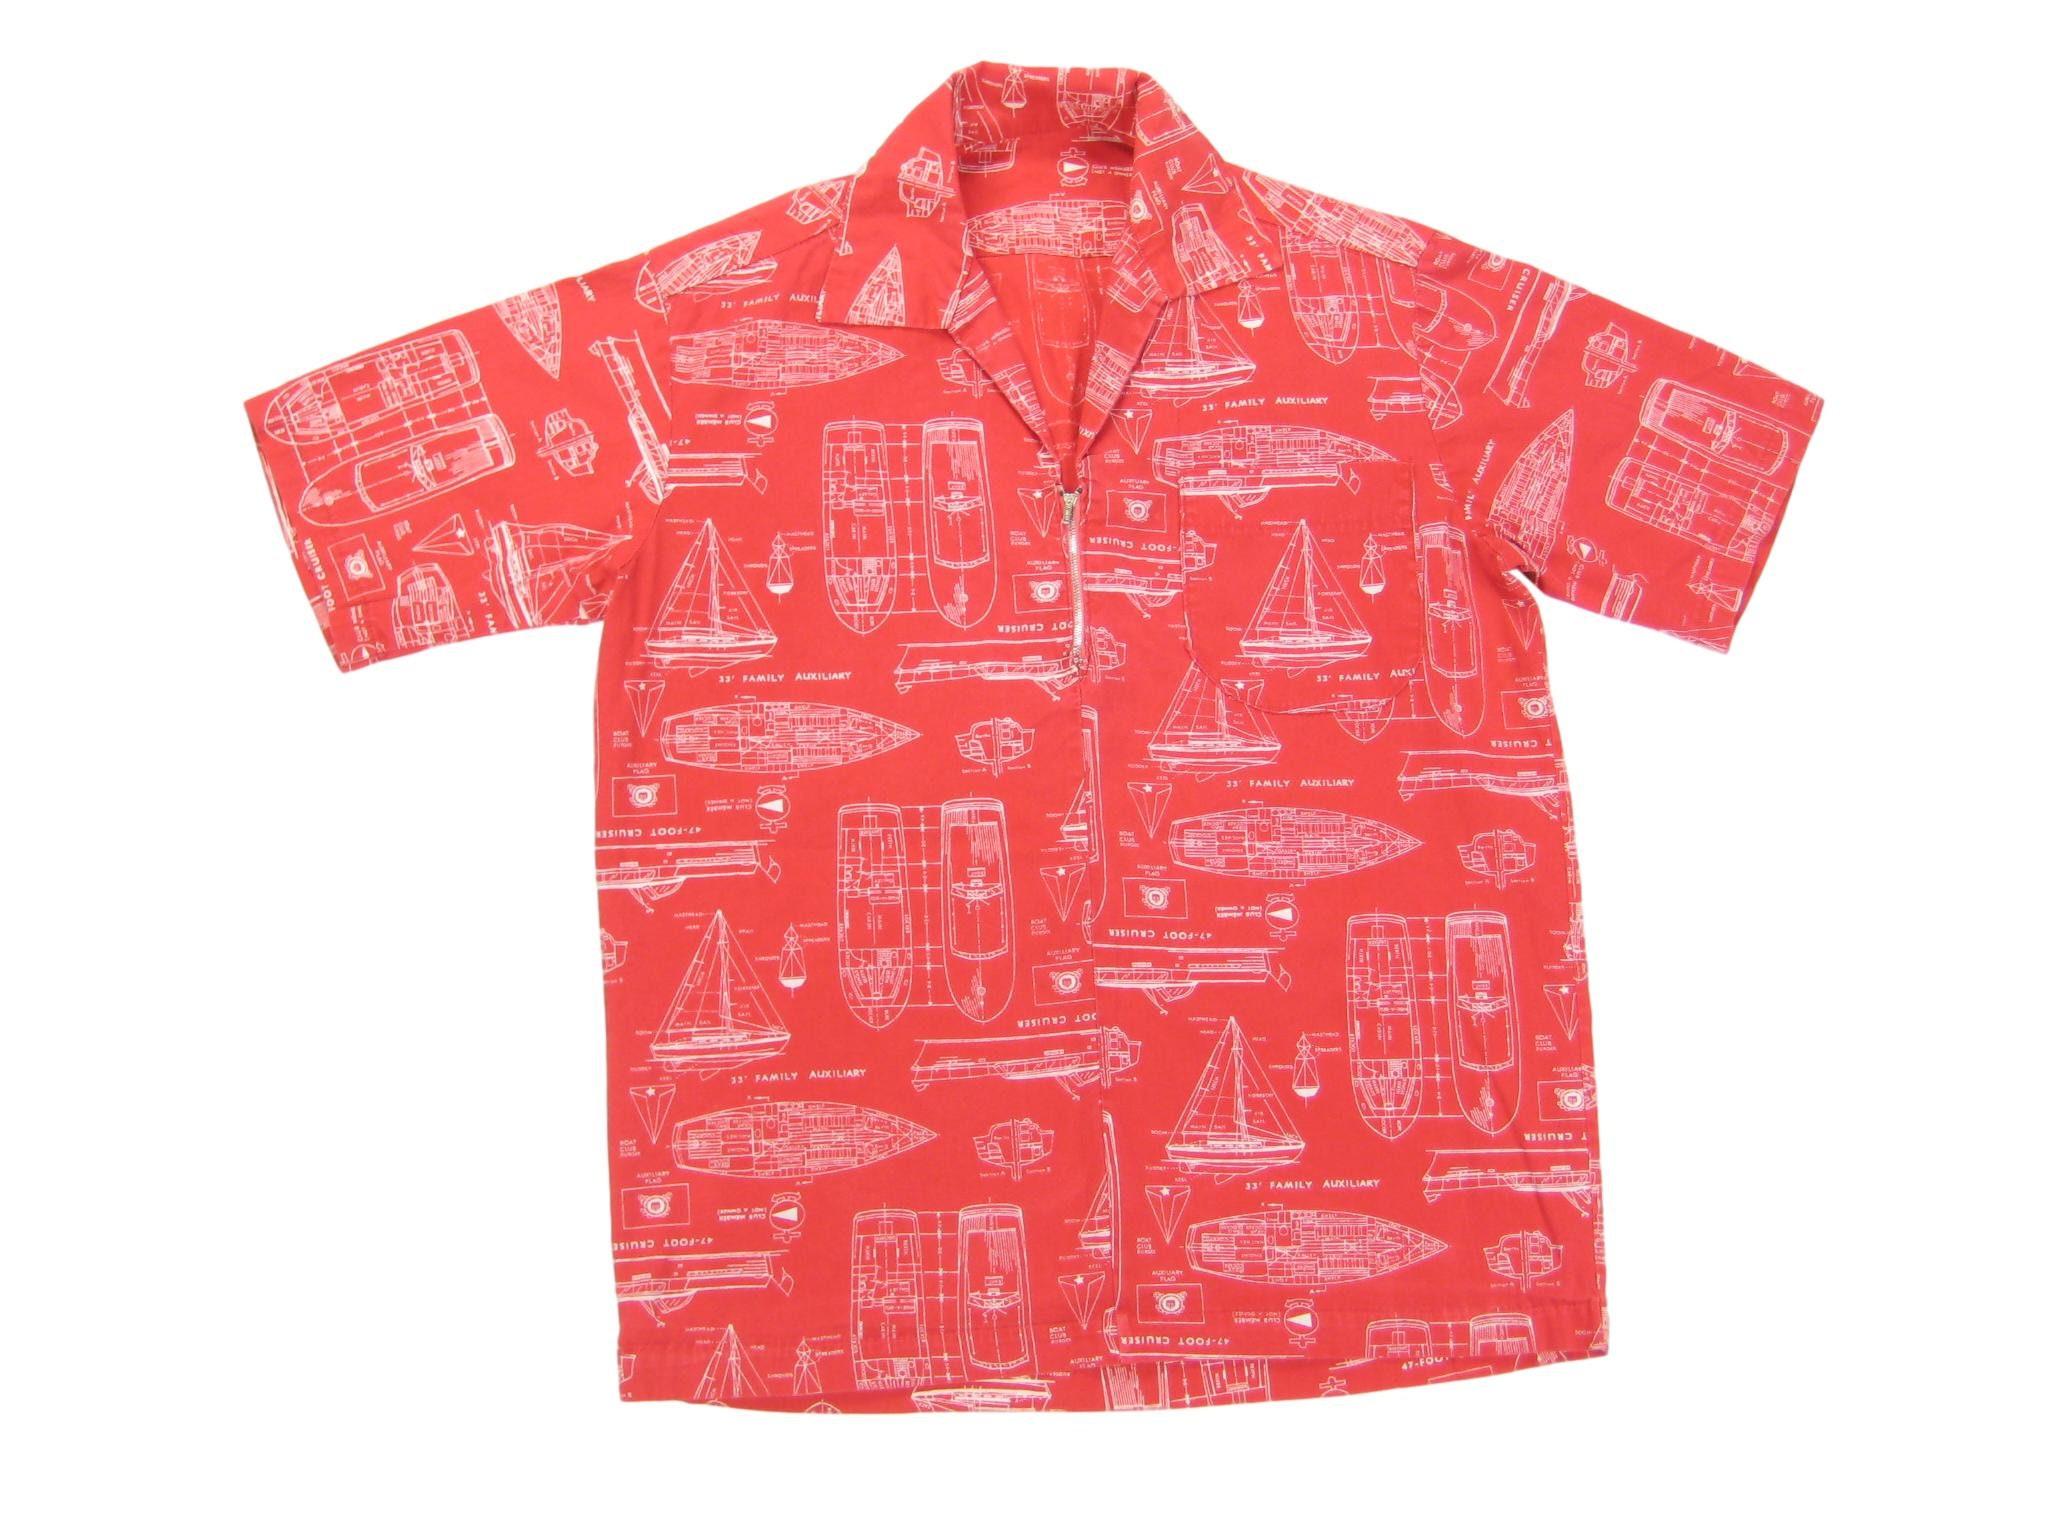 1960s – 70s Men's Ties | Skinny Ties, Slim Ties 1960S Sailboat Schematic Print Popover Shirt Vintage Retro Mens Homemade Cotton Half Zip Camp Collar Short Sleeve XsSSmall $75.00 AT vintagedancer.com